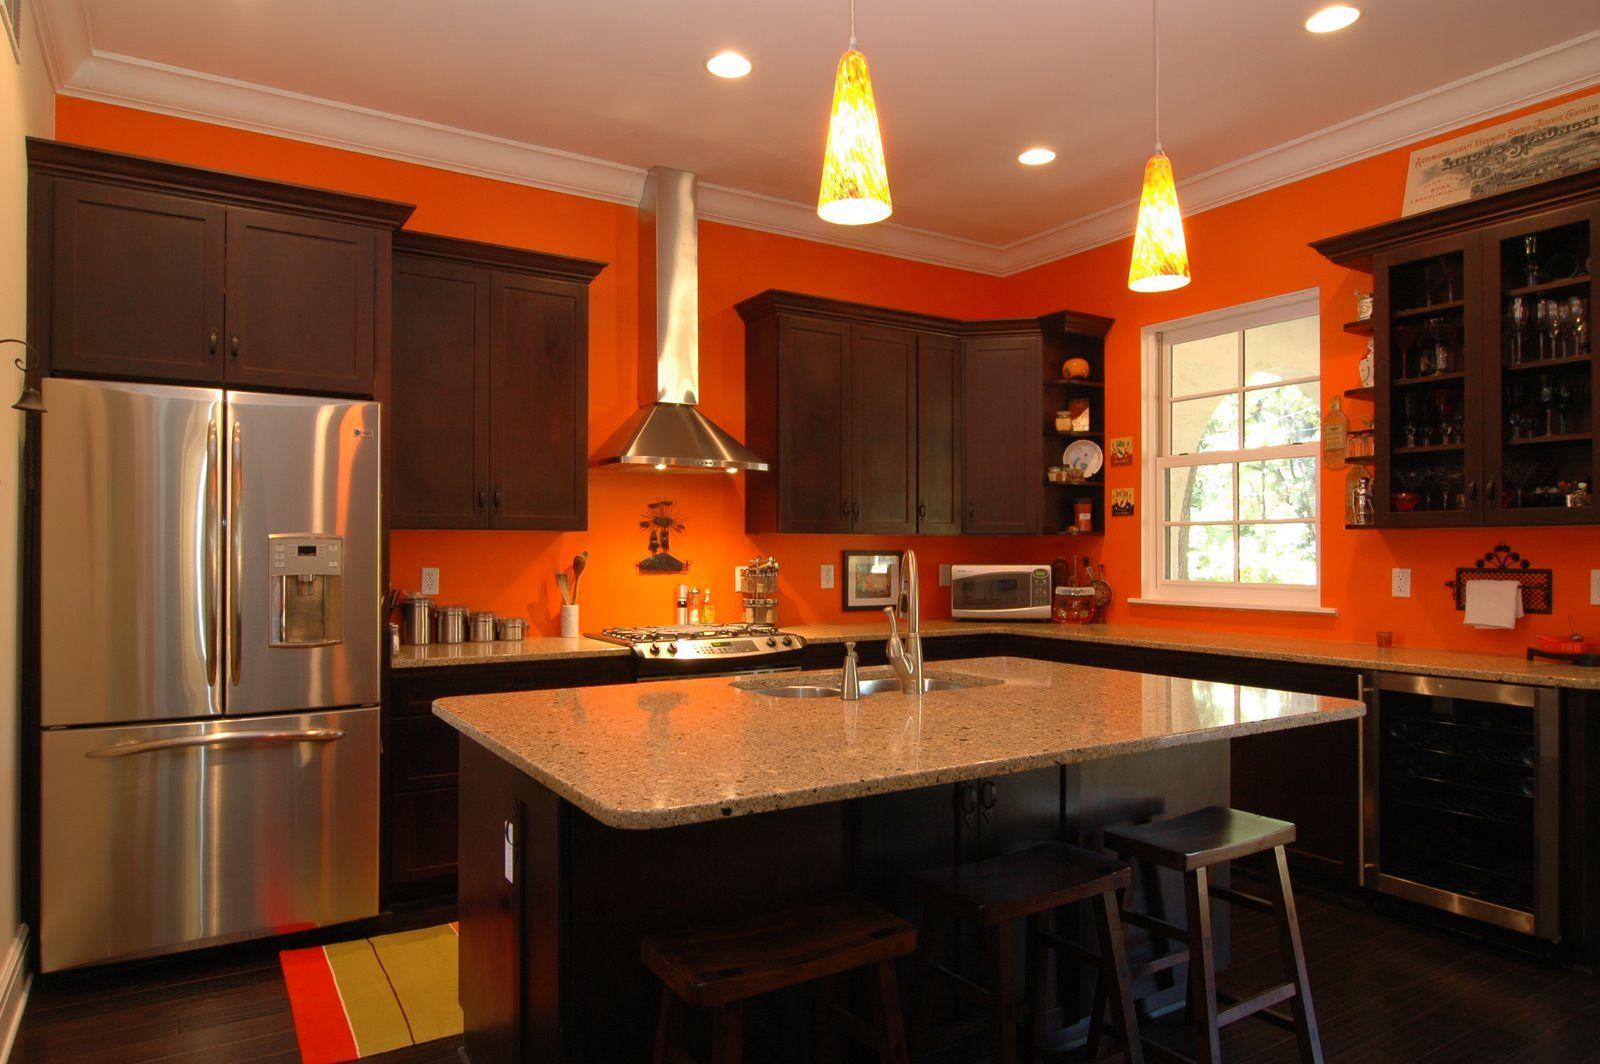 Frankel Main Jpg Image Orange Kitchen Walls Orange Kitchen Decor Burnt Orange Kitchen